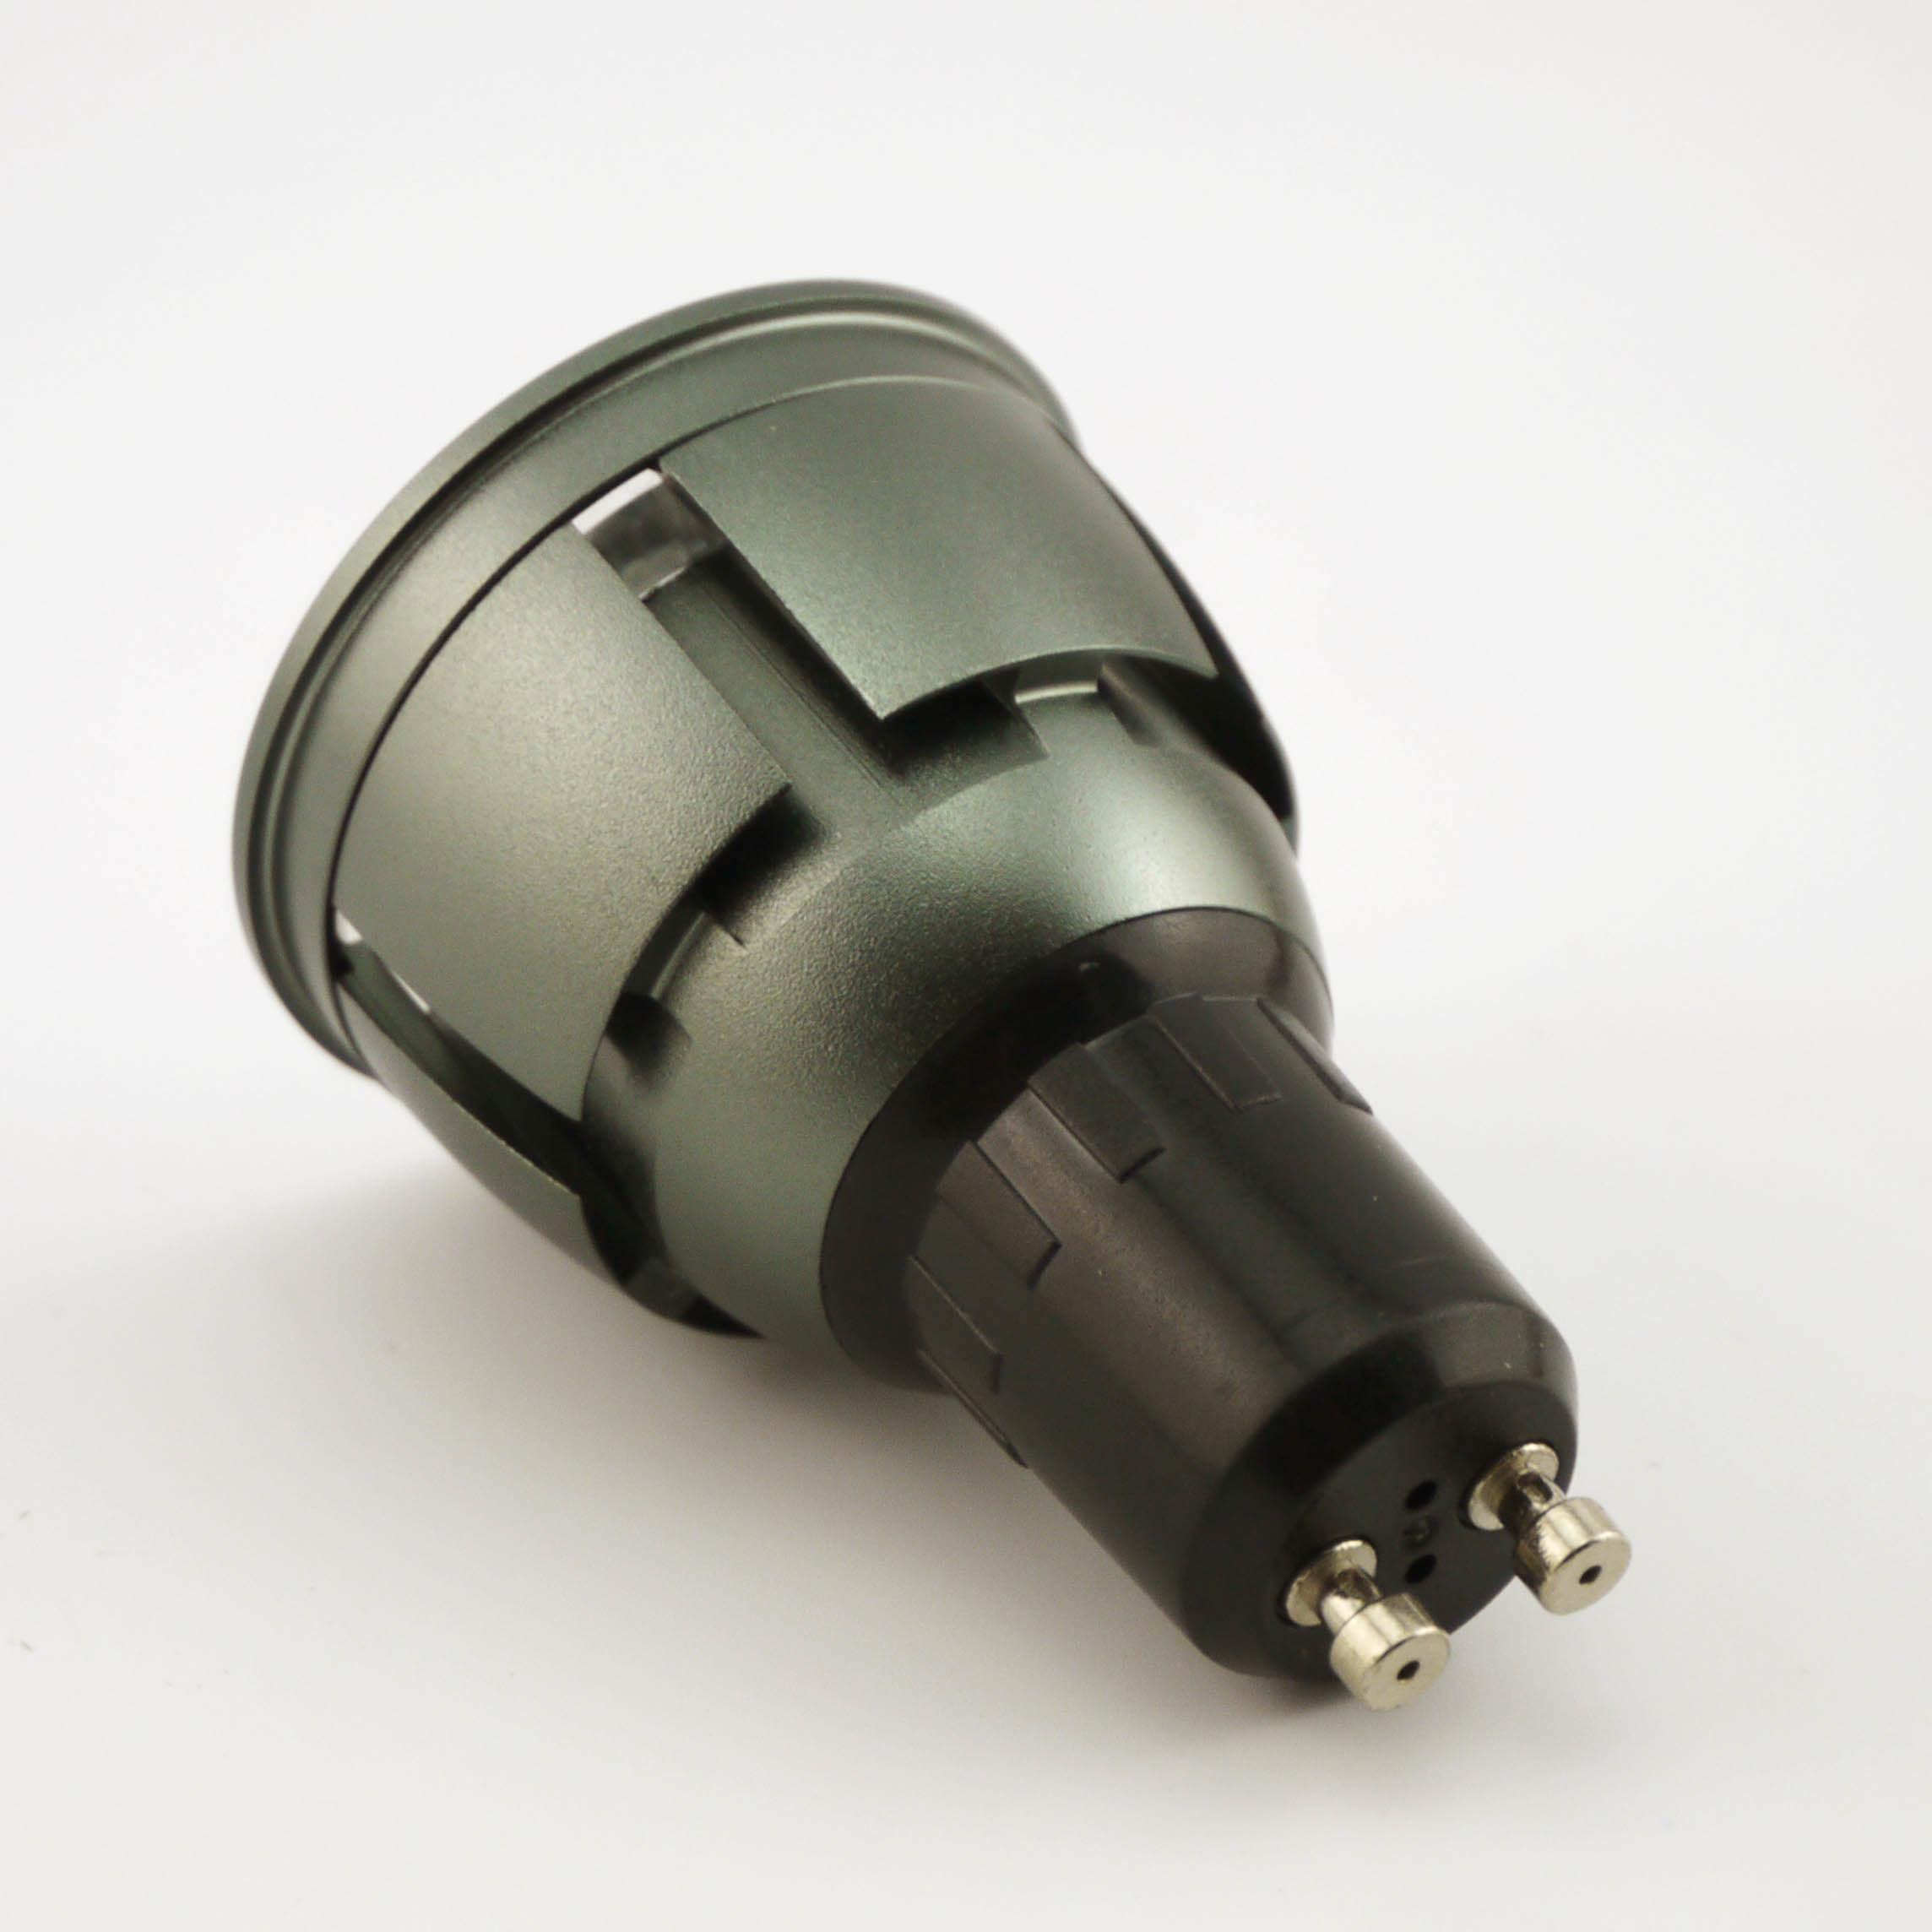 Aluminum 7W COB LED Recessed Downlight GU10 Bulb (LT9002-7W)